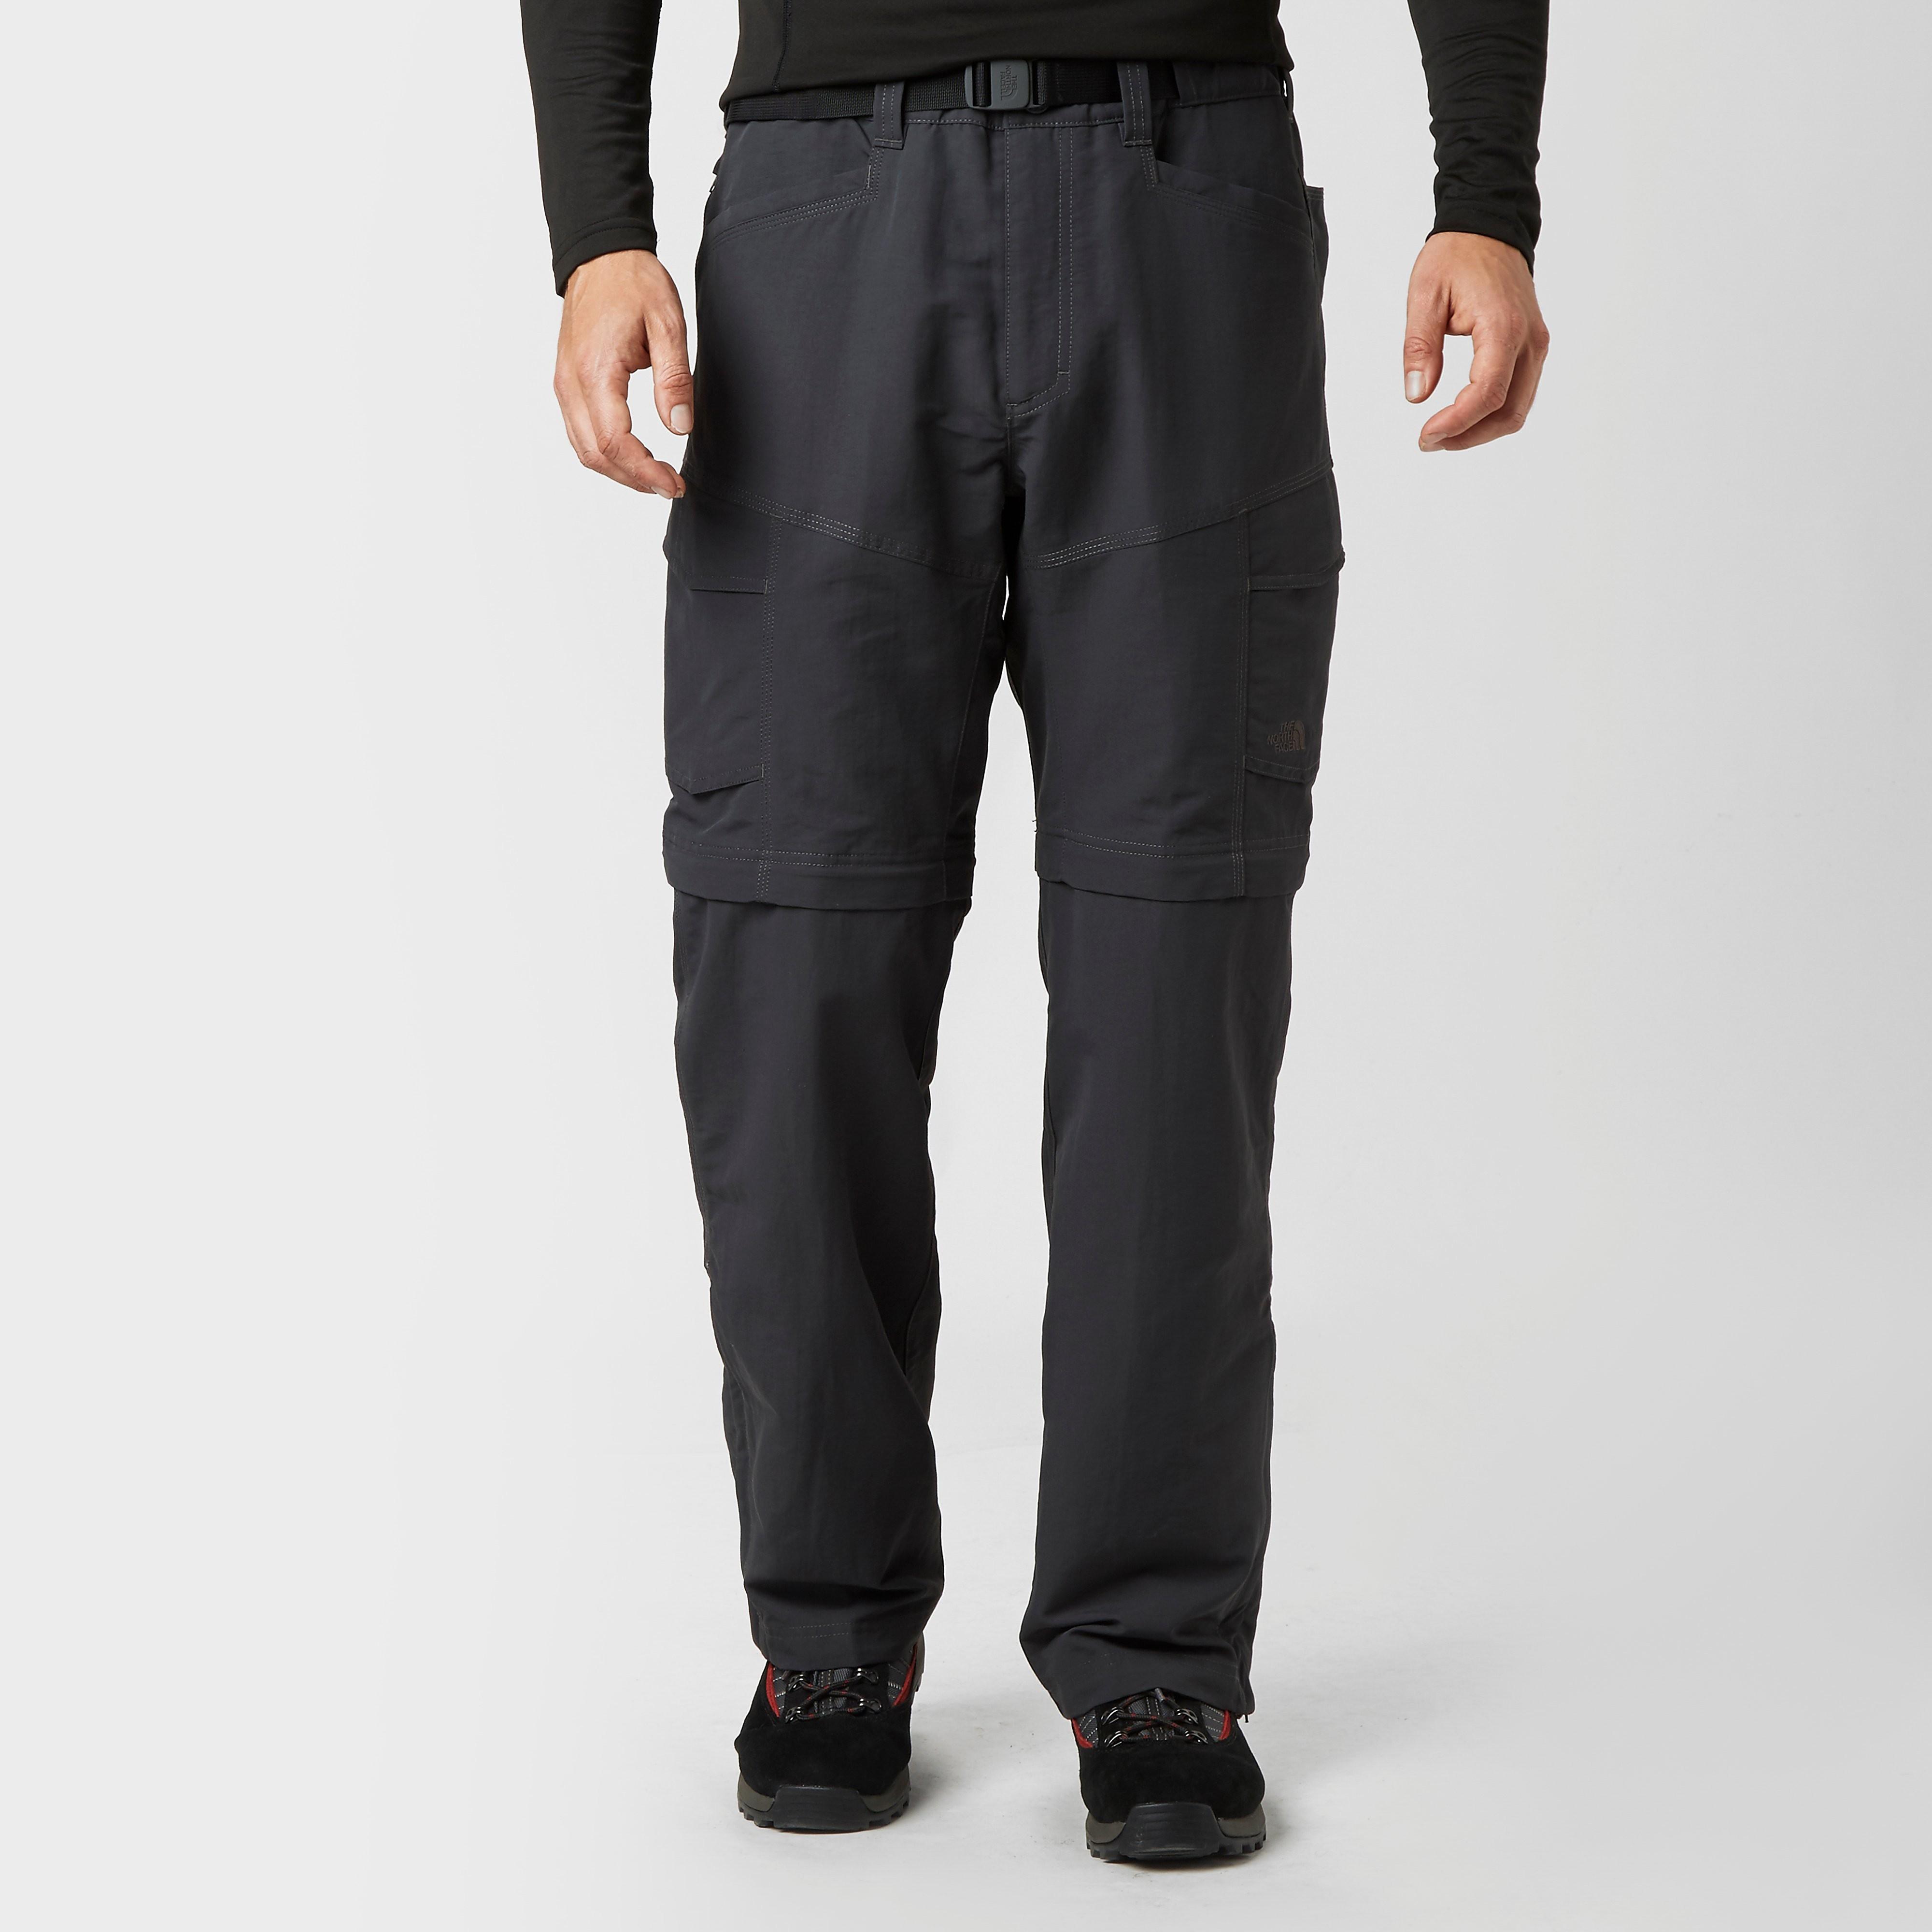 The North Face Paramount Peak II Convertible Men's Pants